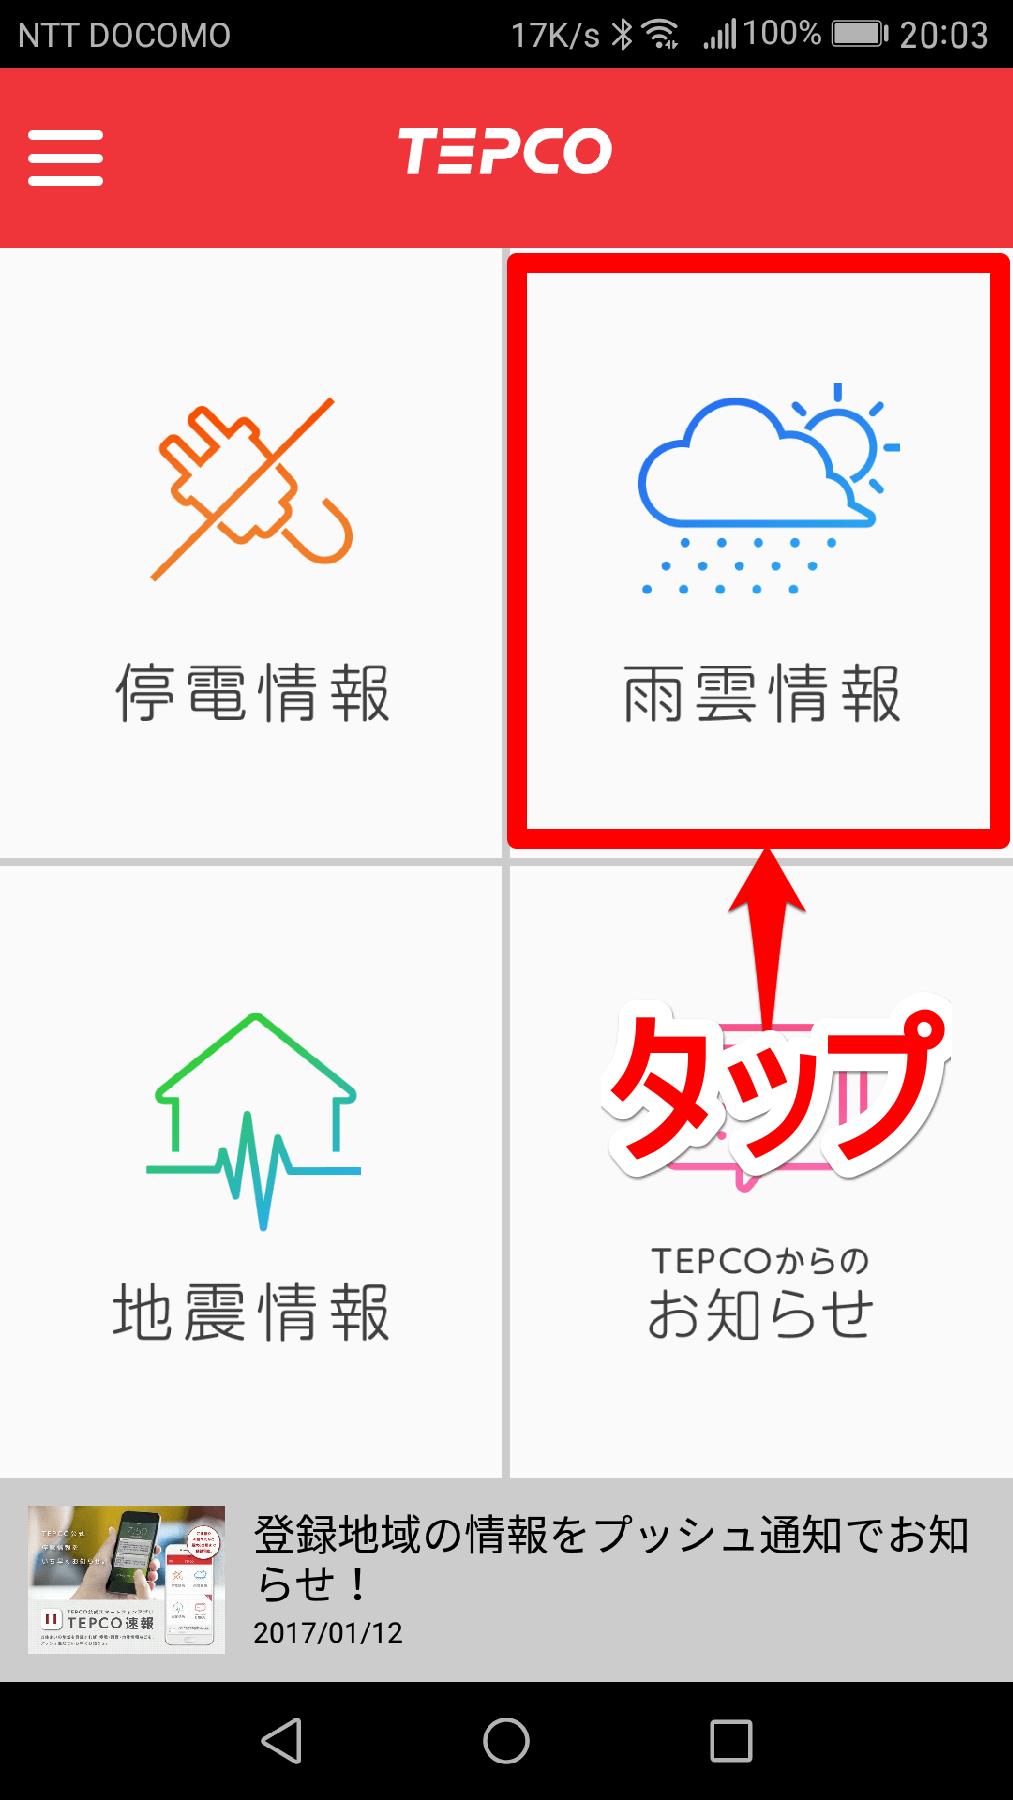 [TEPCO速報]アプリのトップ画面([雨雲情報]をタップするところ